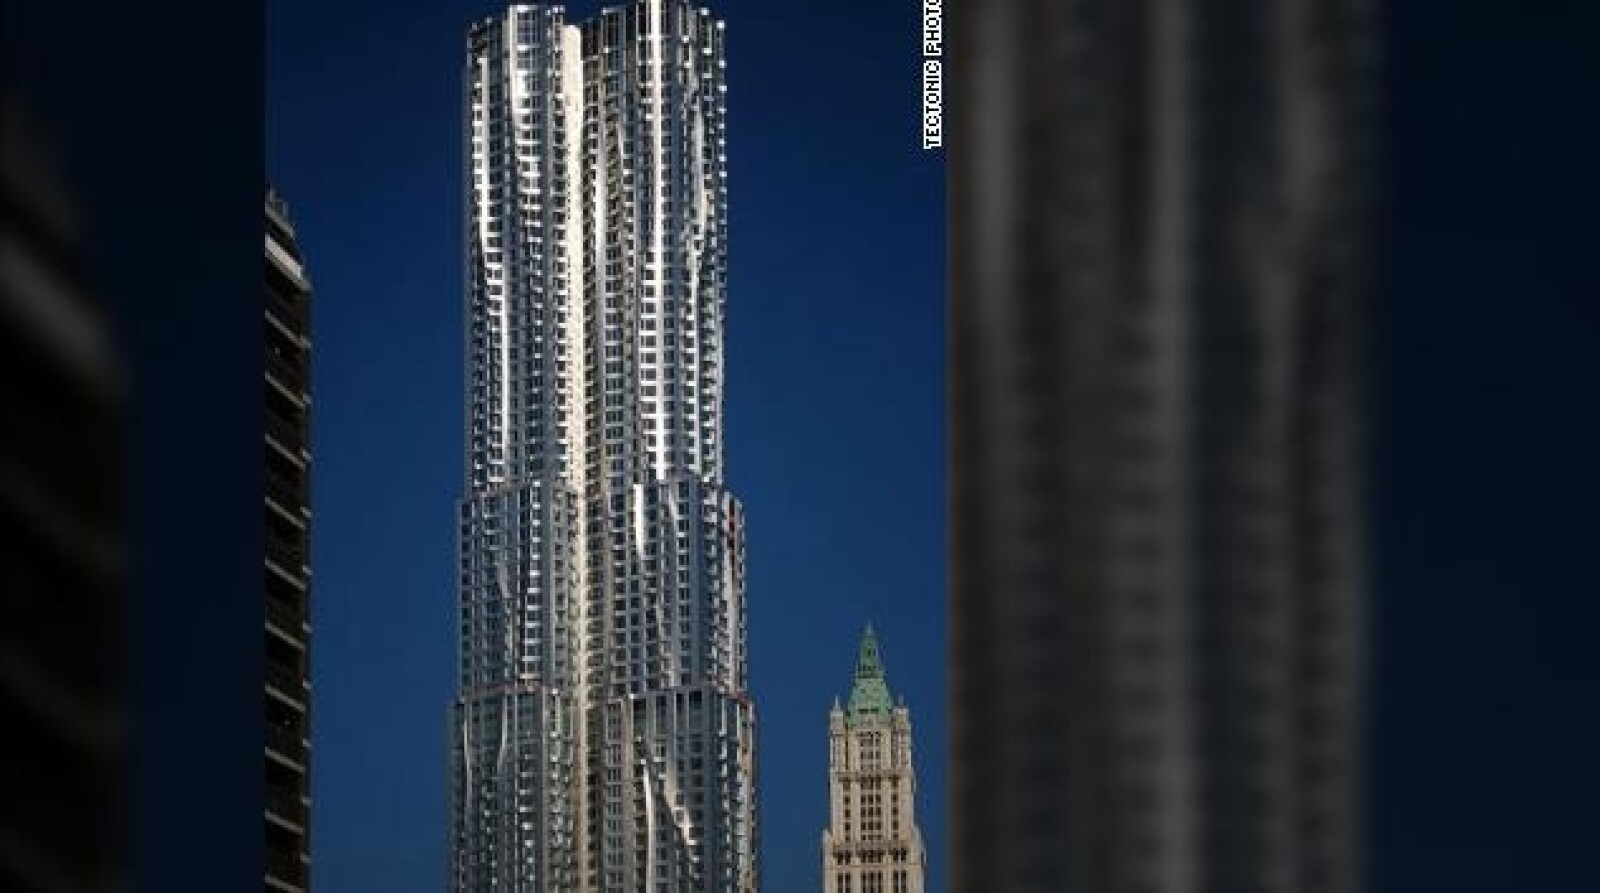 edificios estrambóticos 4